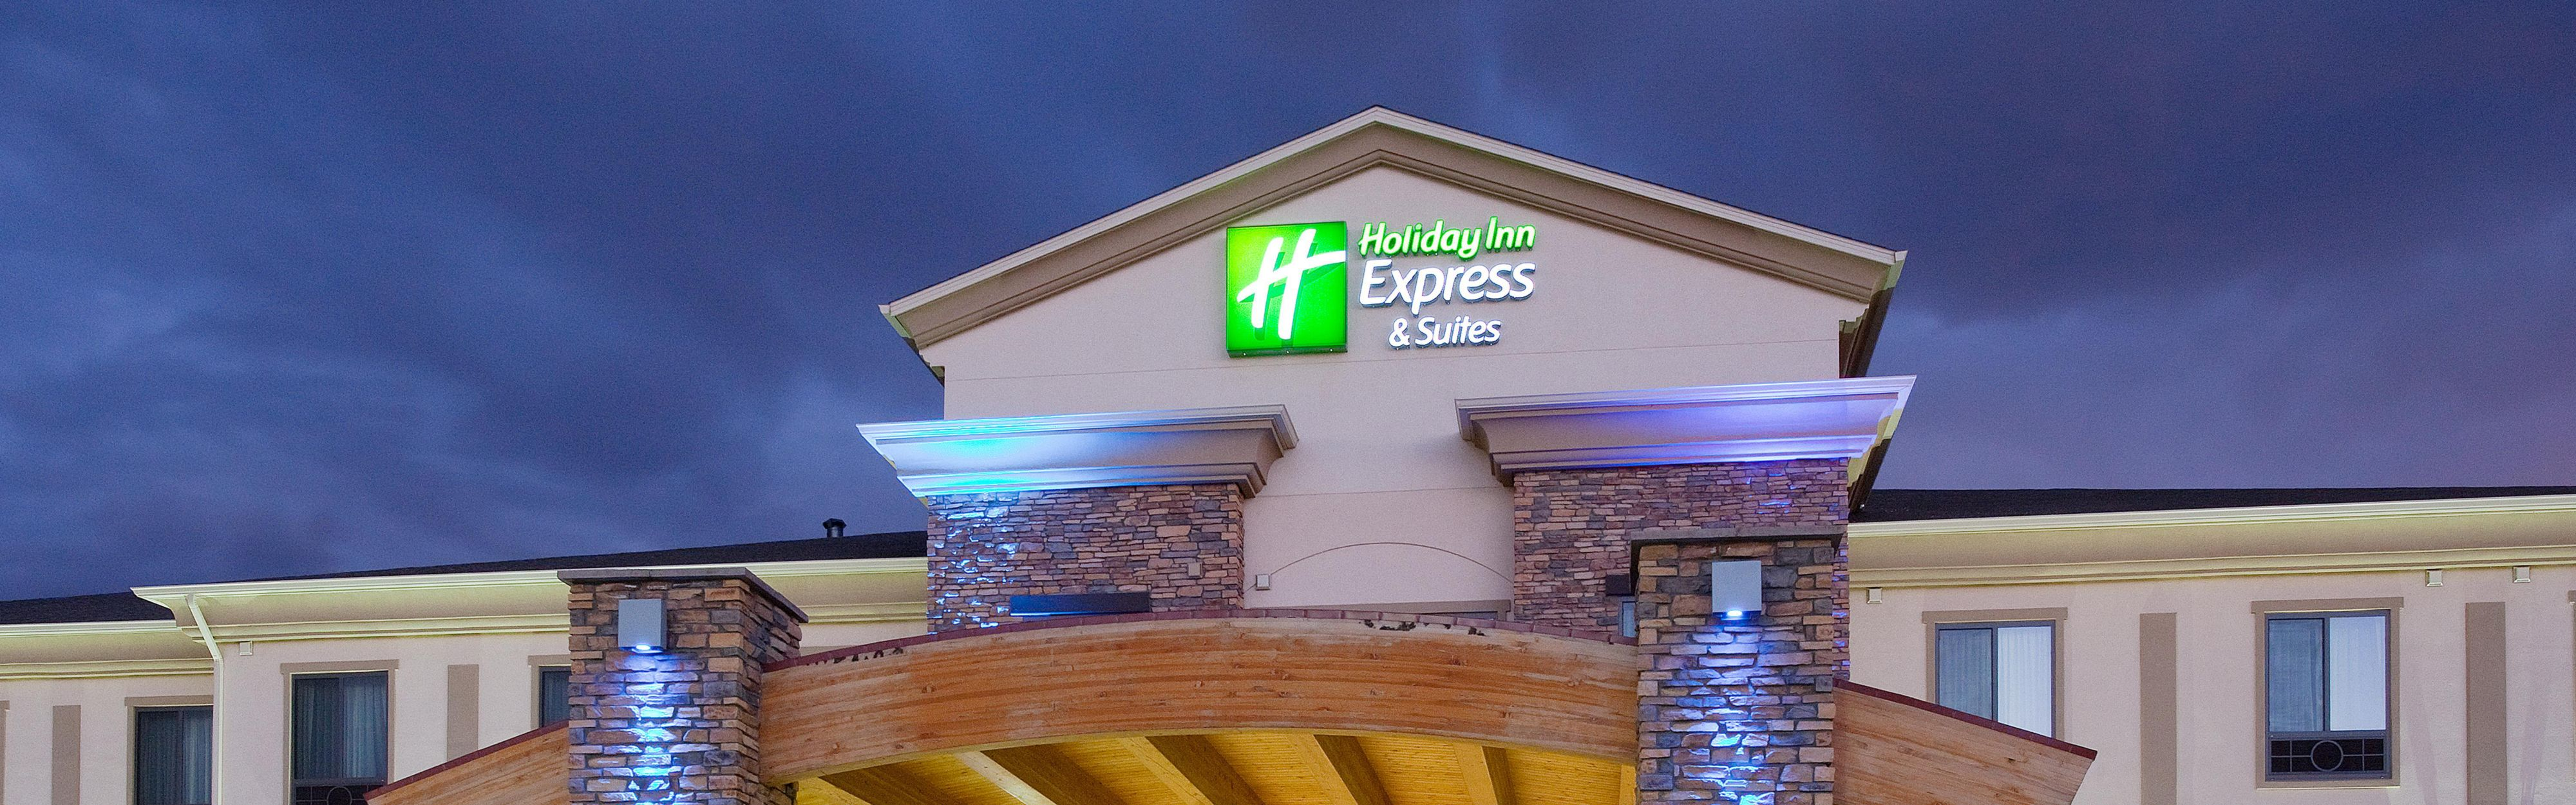 Holiday Inn Express & Suites Loveland image 0